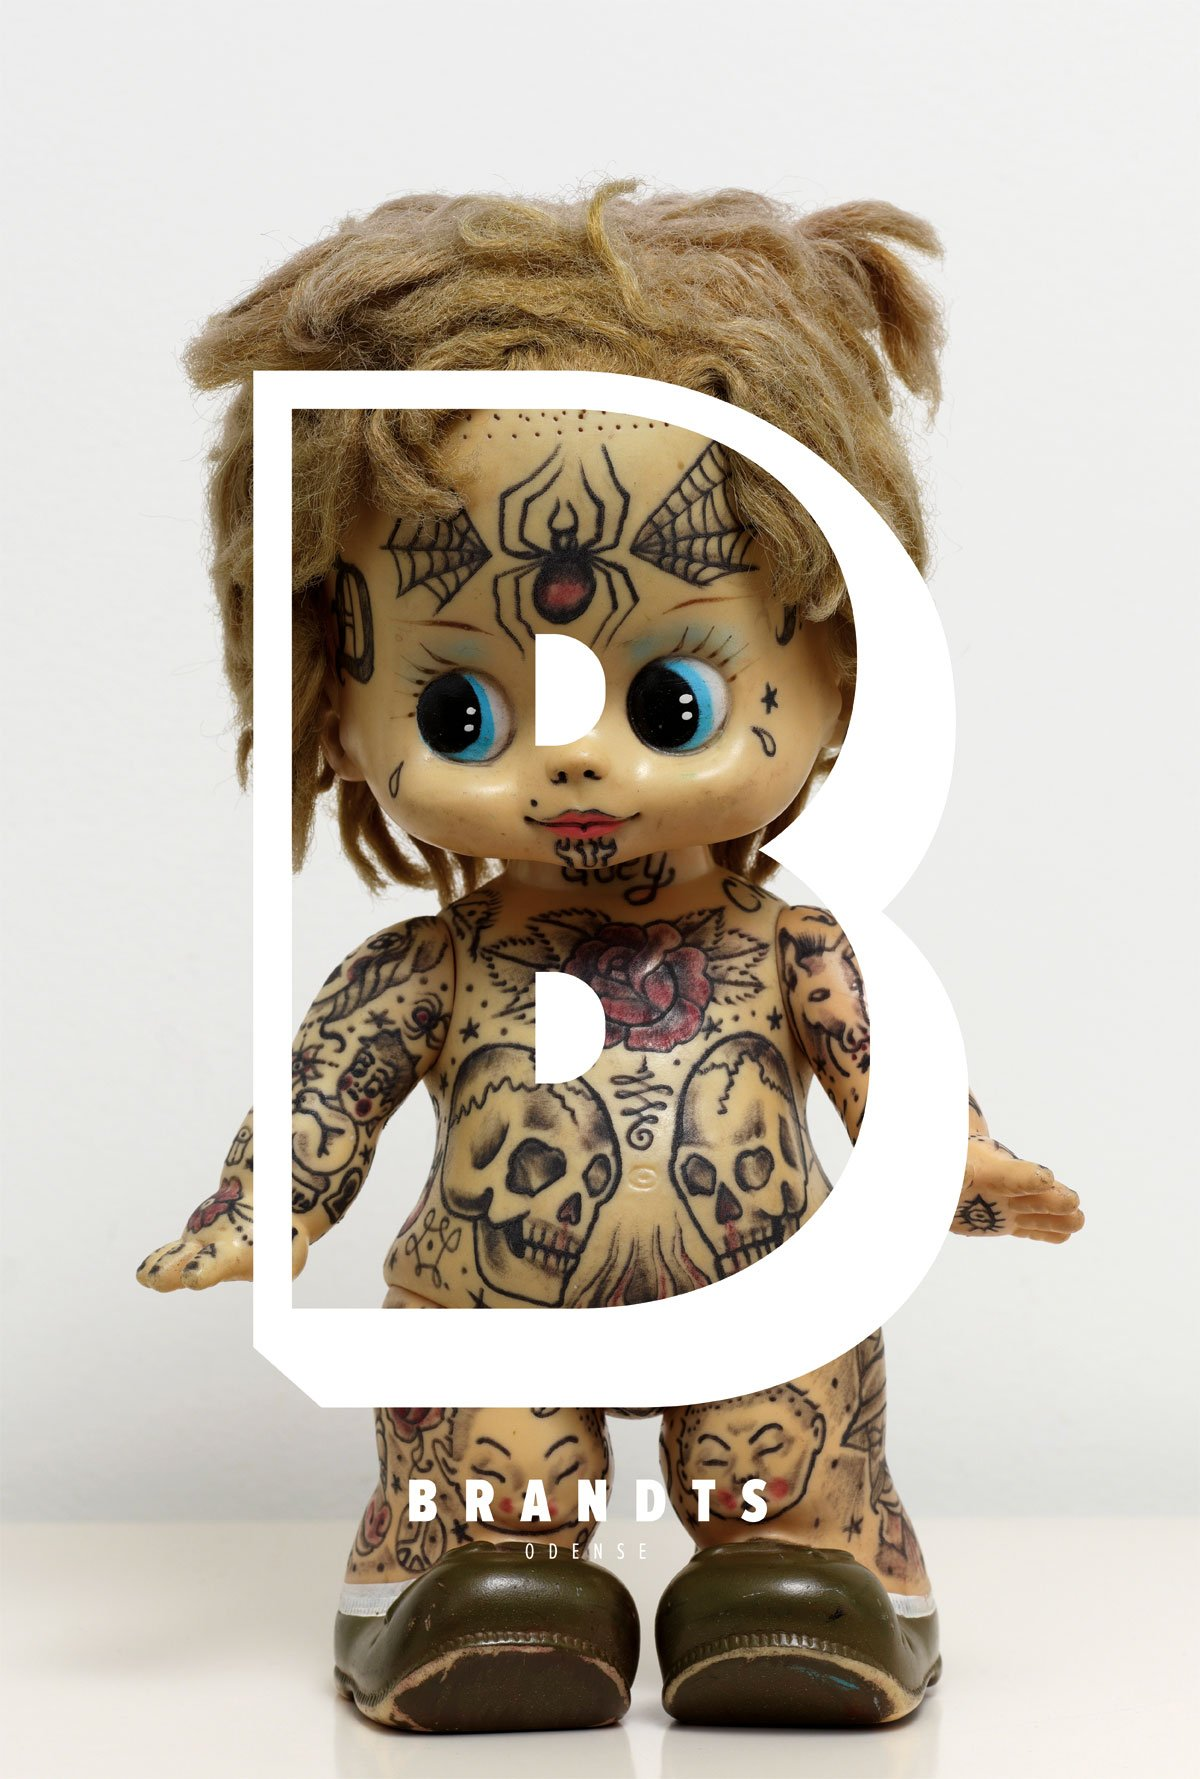 stupidstudio_case_rebranding_Brandts_museum_tattoo_doll